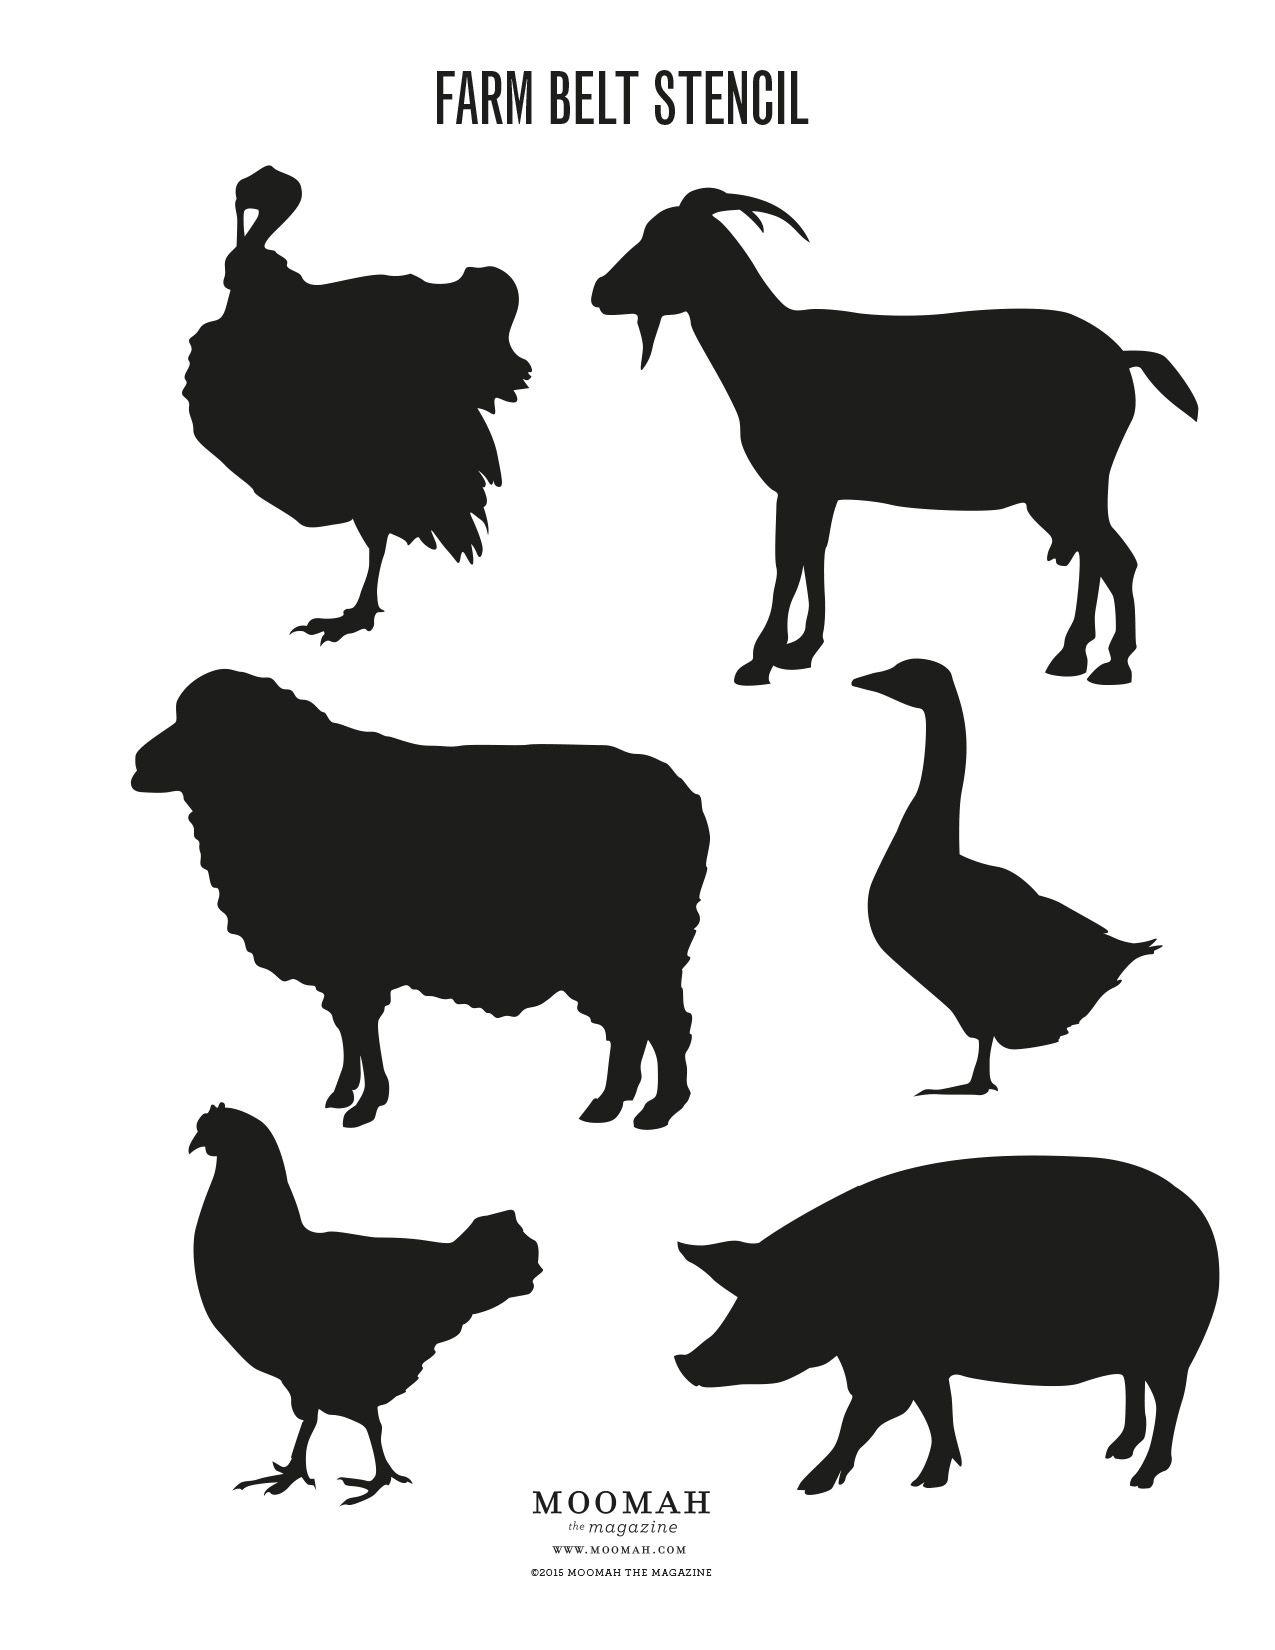 Farmbeltstencil Full Jpg 1 275 1 650 Pixels Animal Stencil Farm Animal Coloring Pages Animal Cutouts